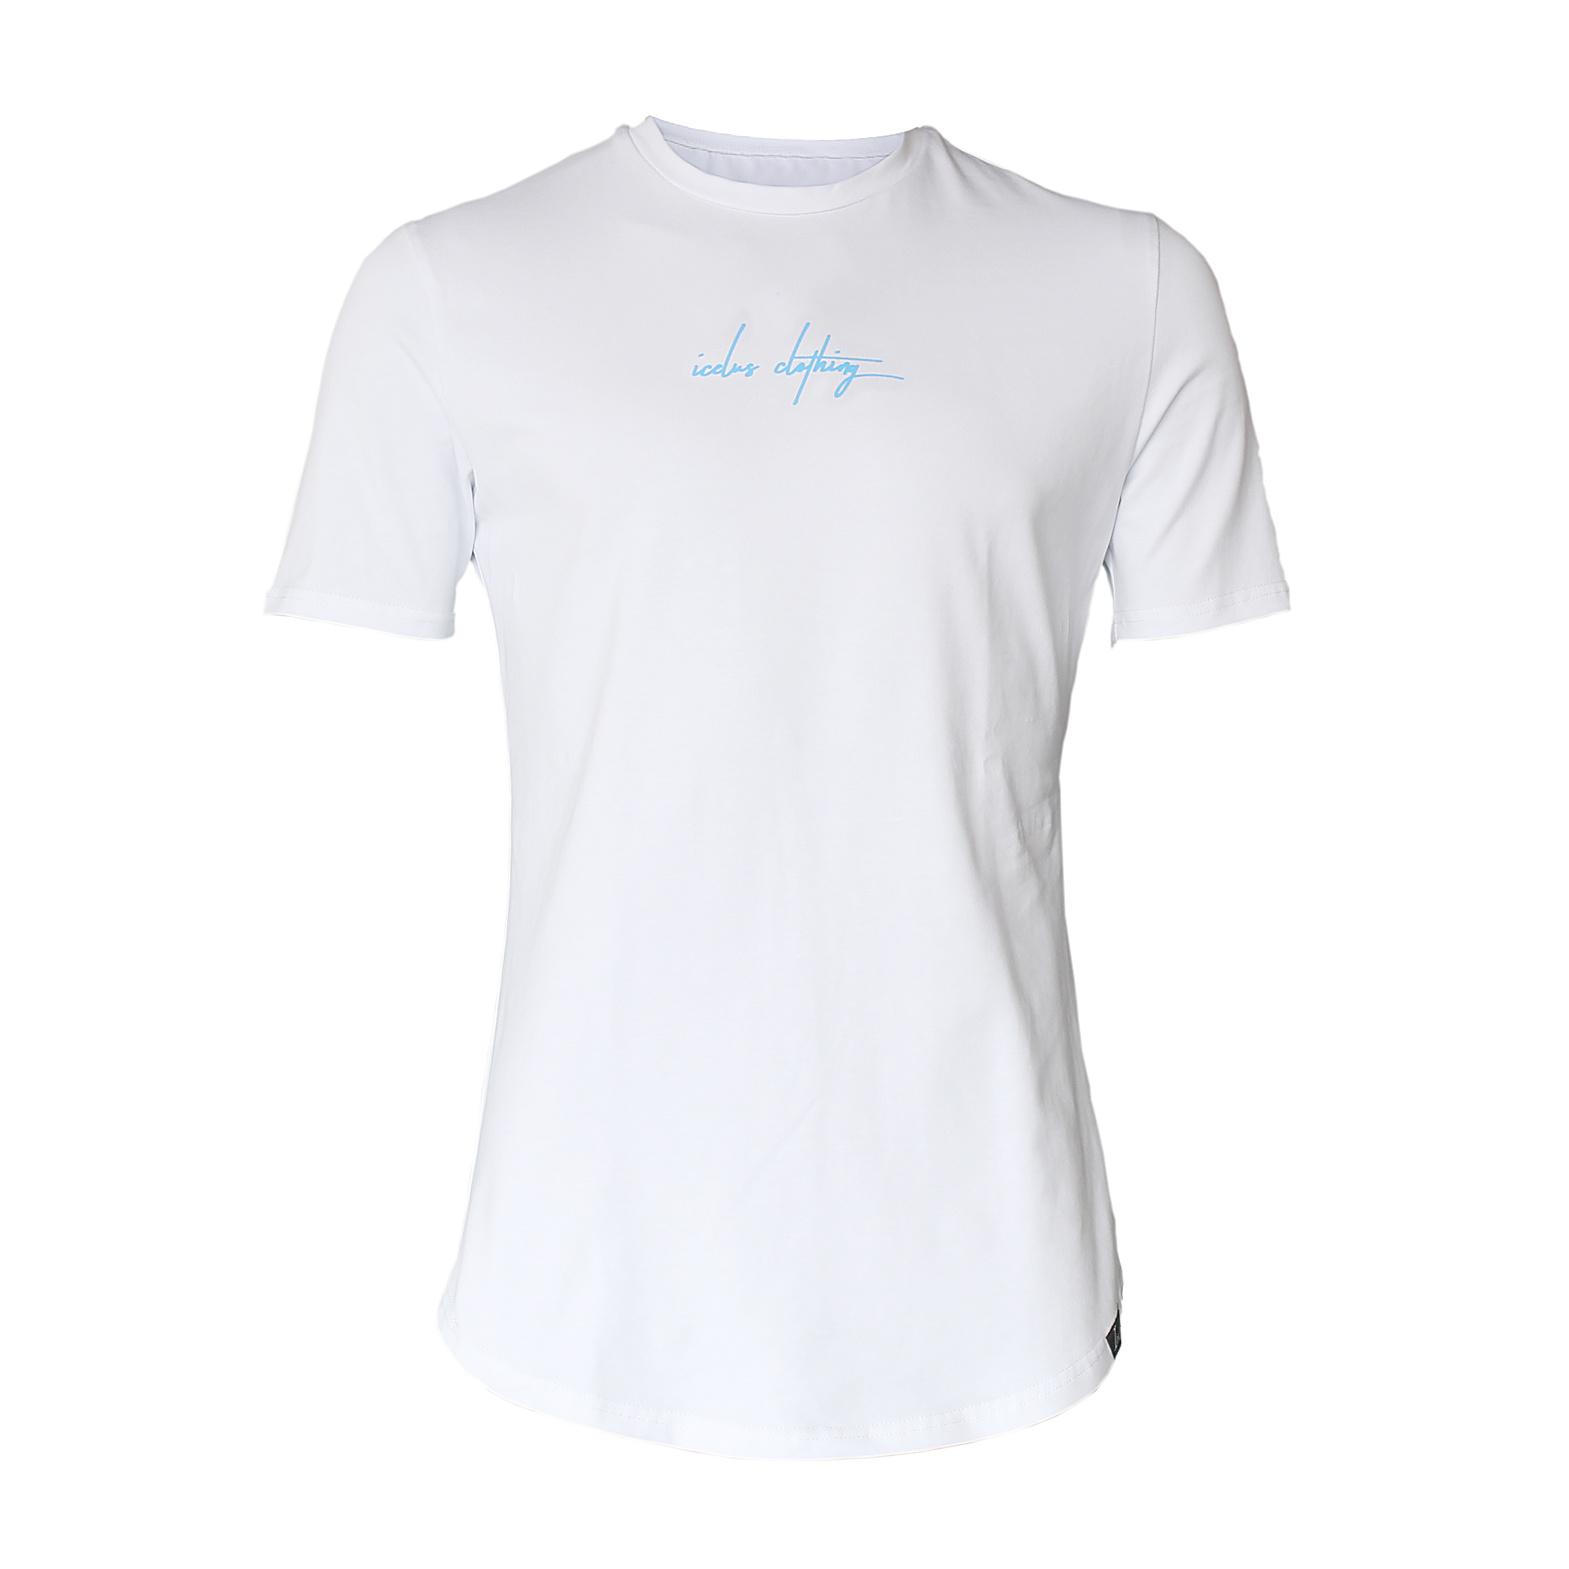 Icelus Clothing Maison Series Blue White